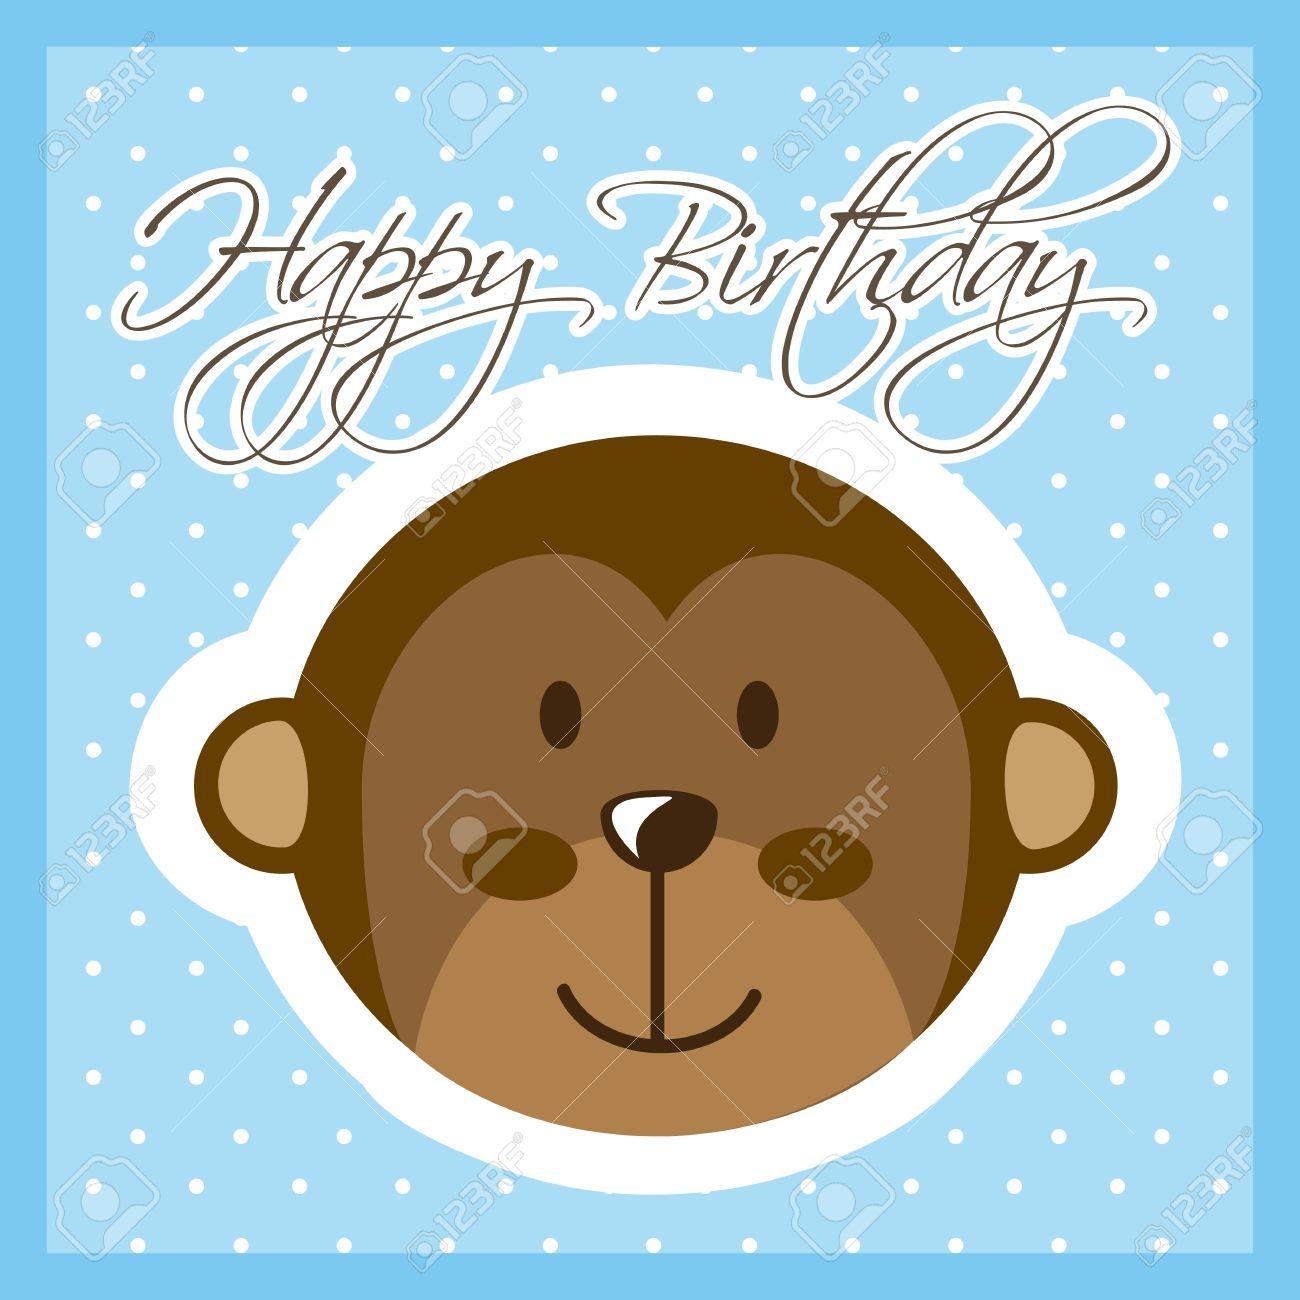 Happy Birthday Card With Monkey Vector Illustration Stock